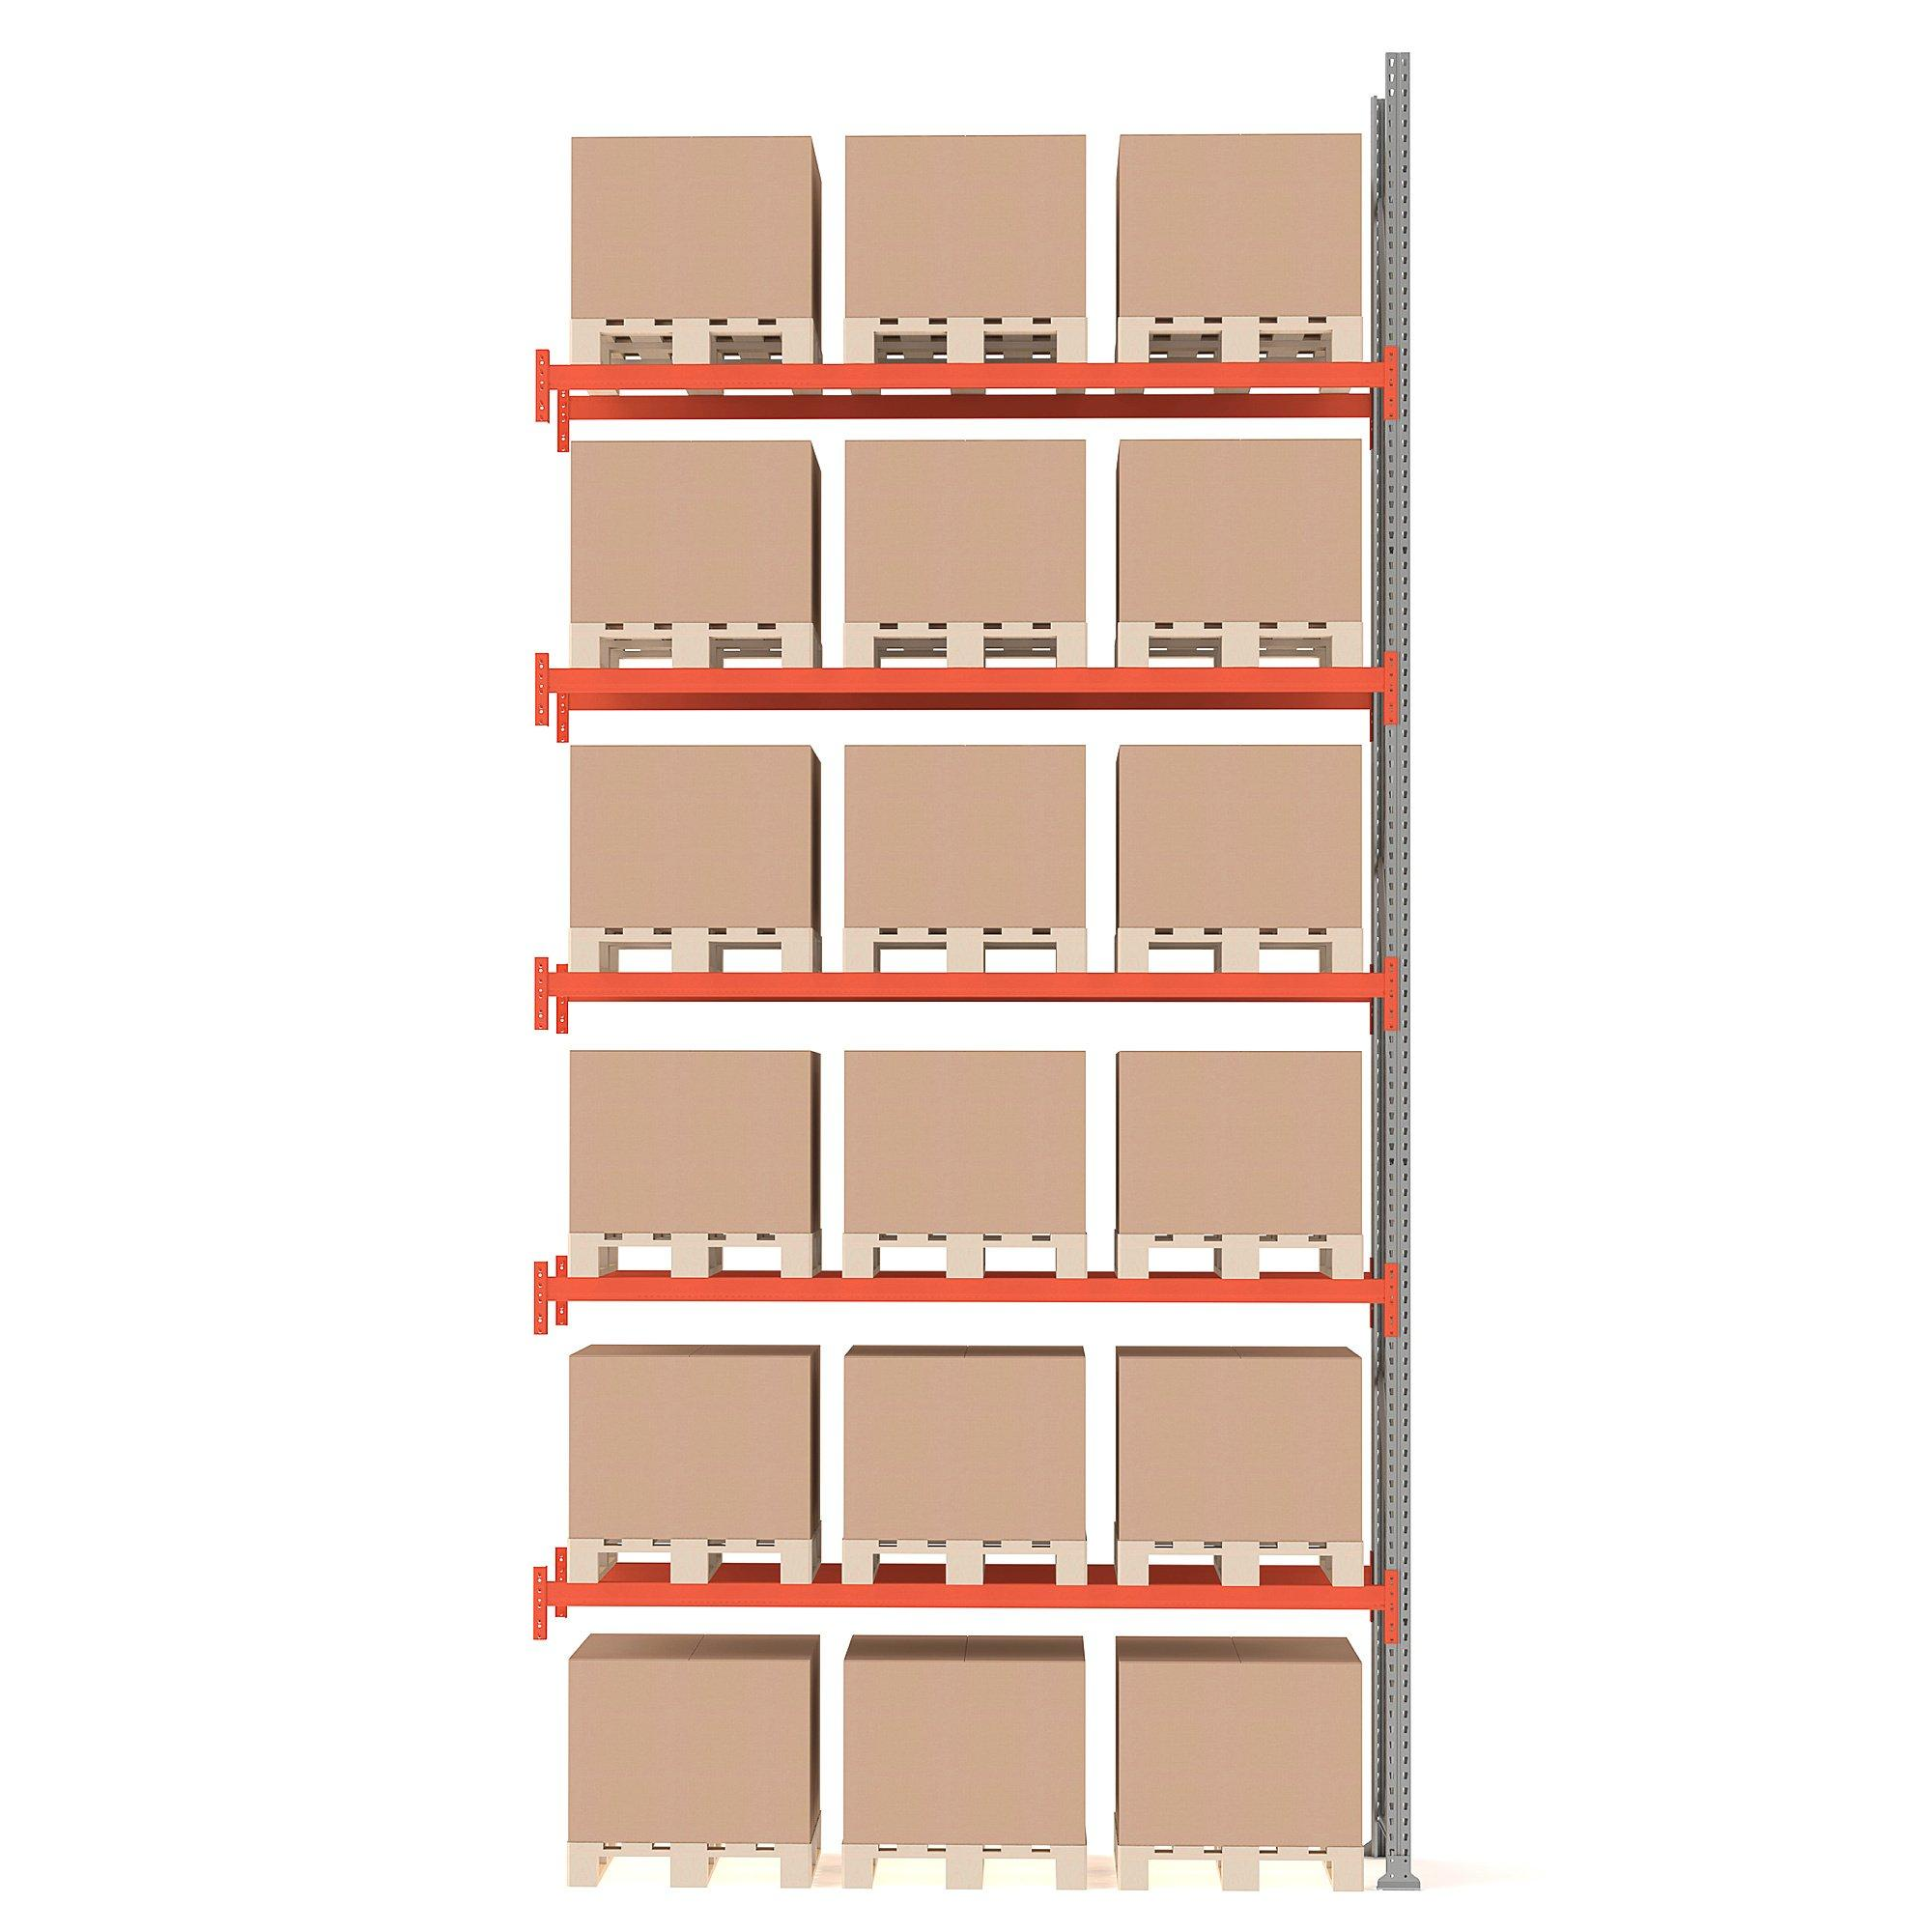 Paletový regál Ultimate, prídavná sekcia, 18 paliet, 6000x2750x1100 mm